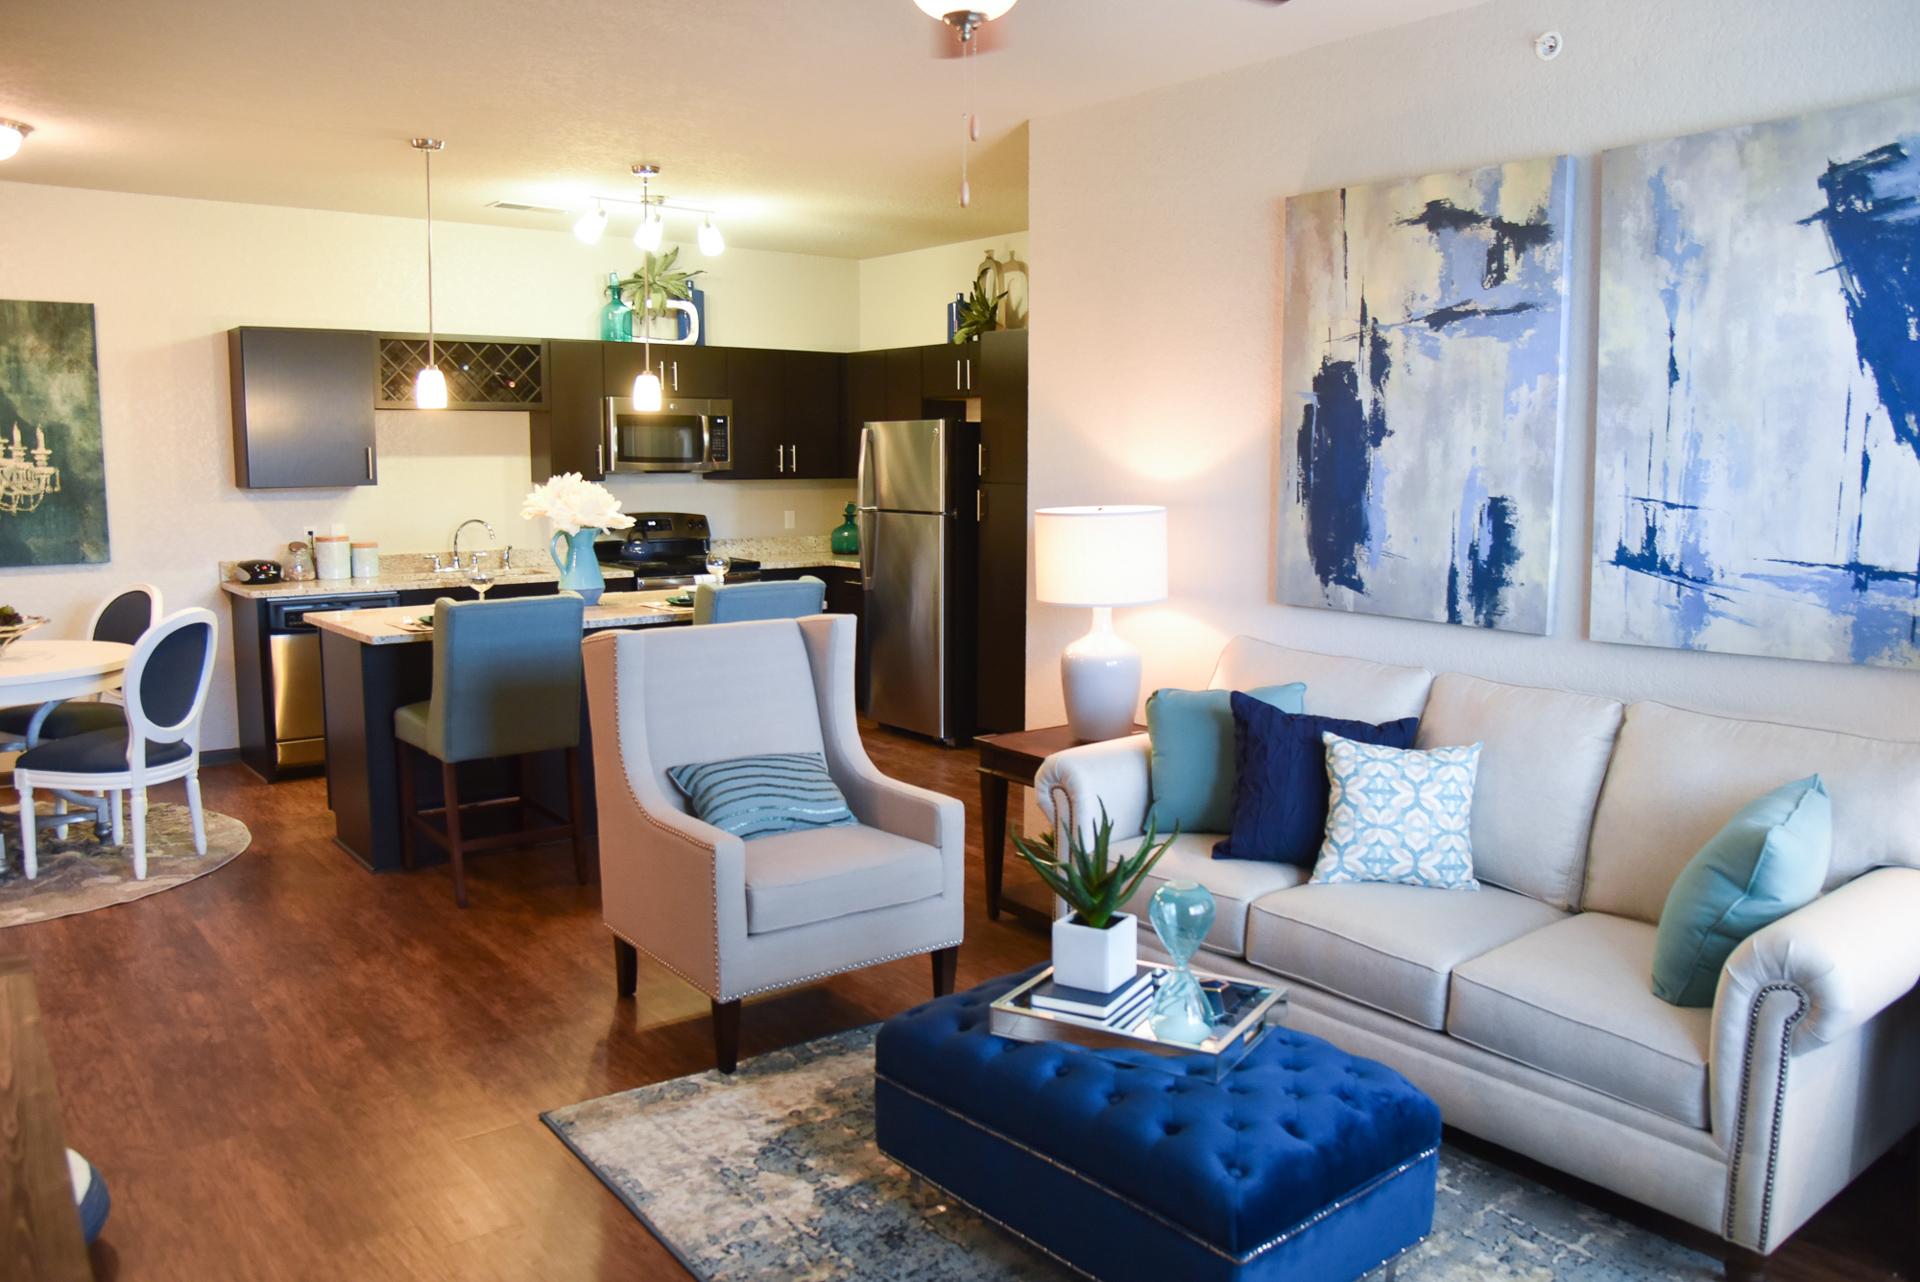 Springs at Knapp's Crossing living room open concept  floor plan